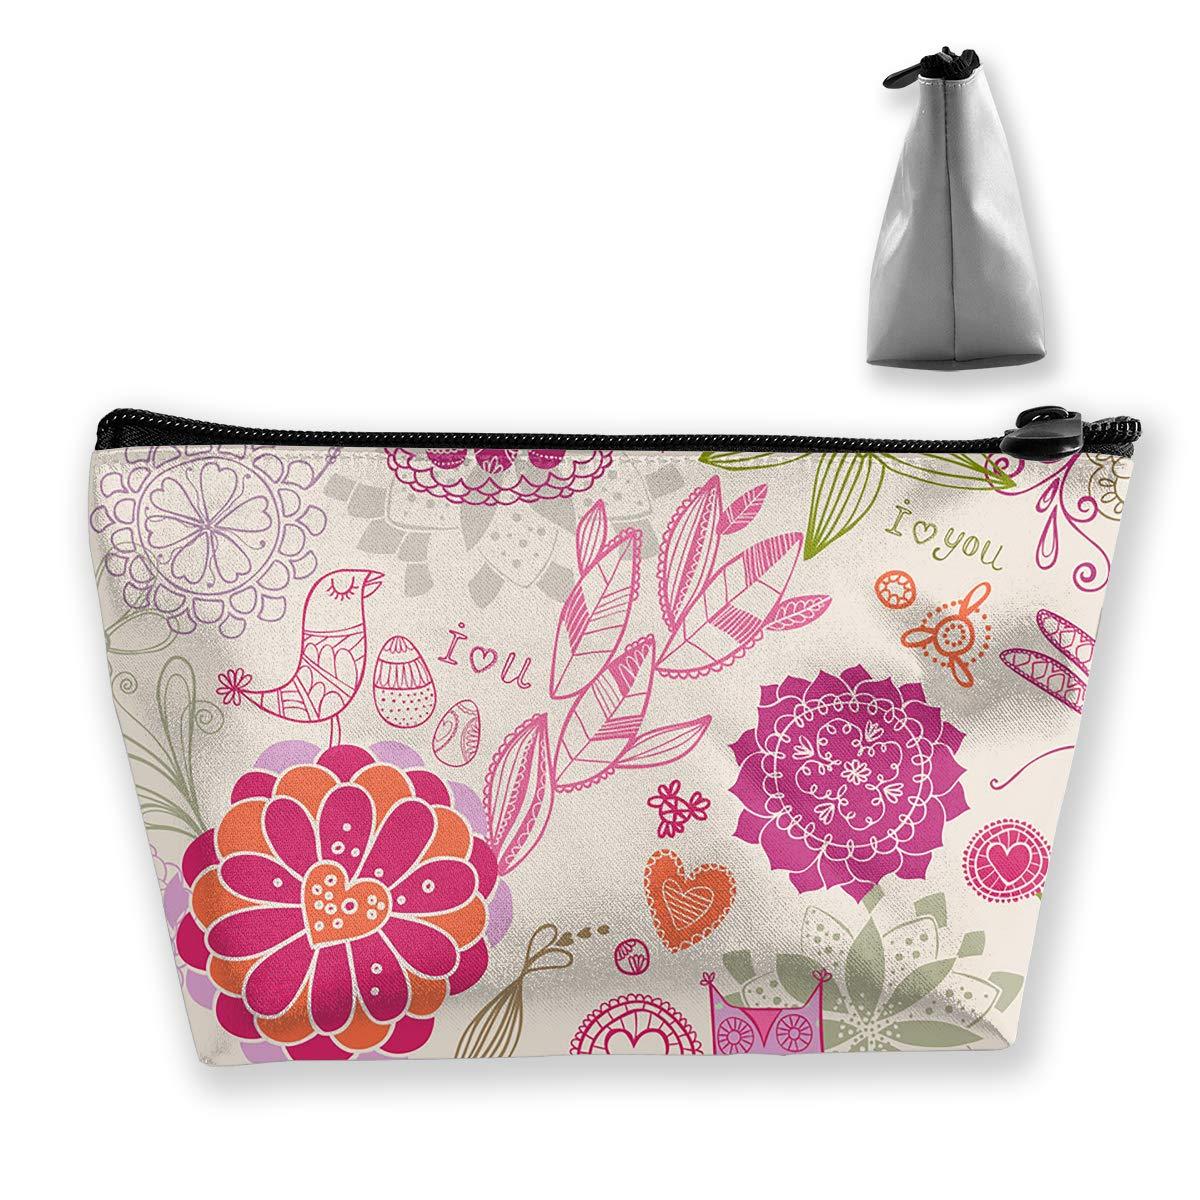 8b2eca3181 Amazon.com  LIBINGZ Portable Cosmetic Bag for Storage of Bulk Bag Hand  Travel Bag Storage Bag New Portable Travel Home Bag Storage  Home   Kitchen